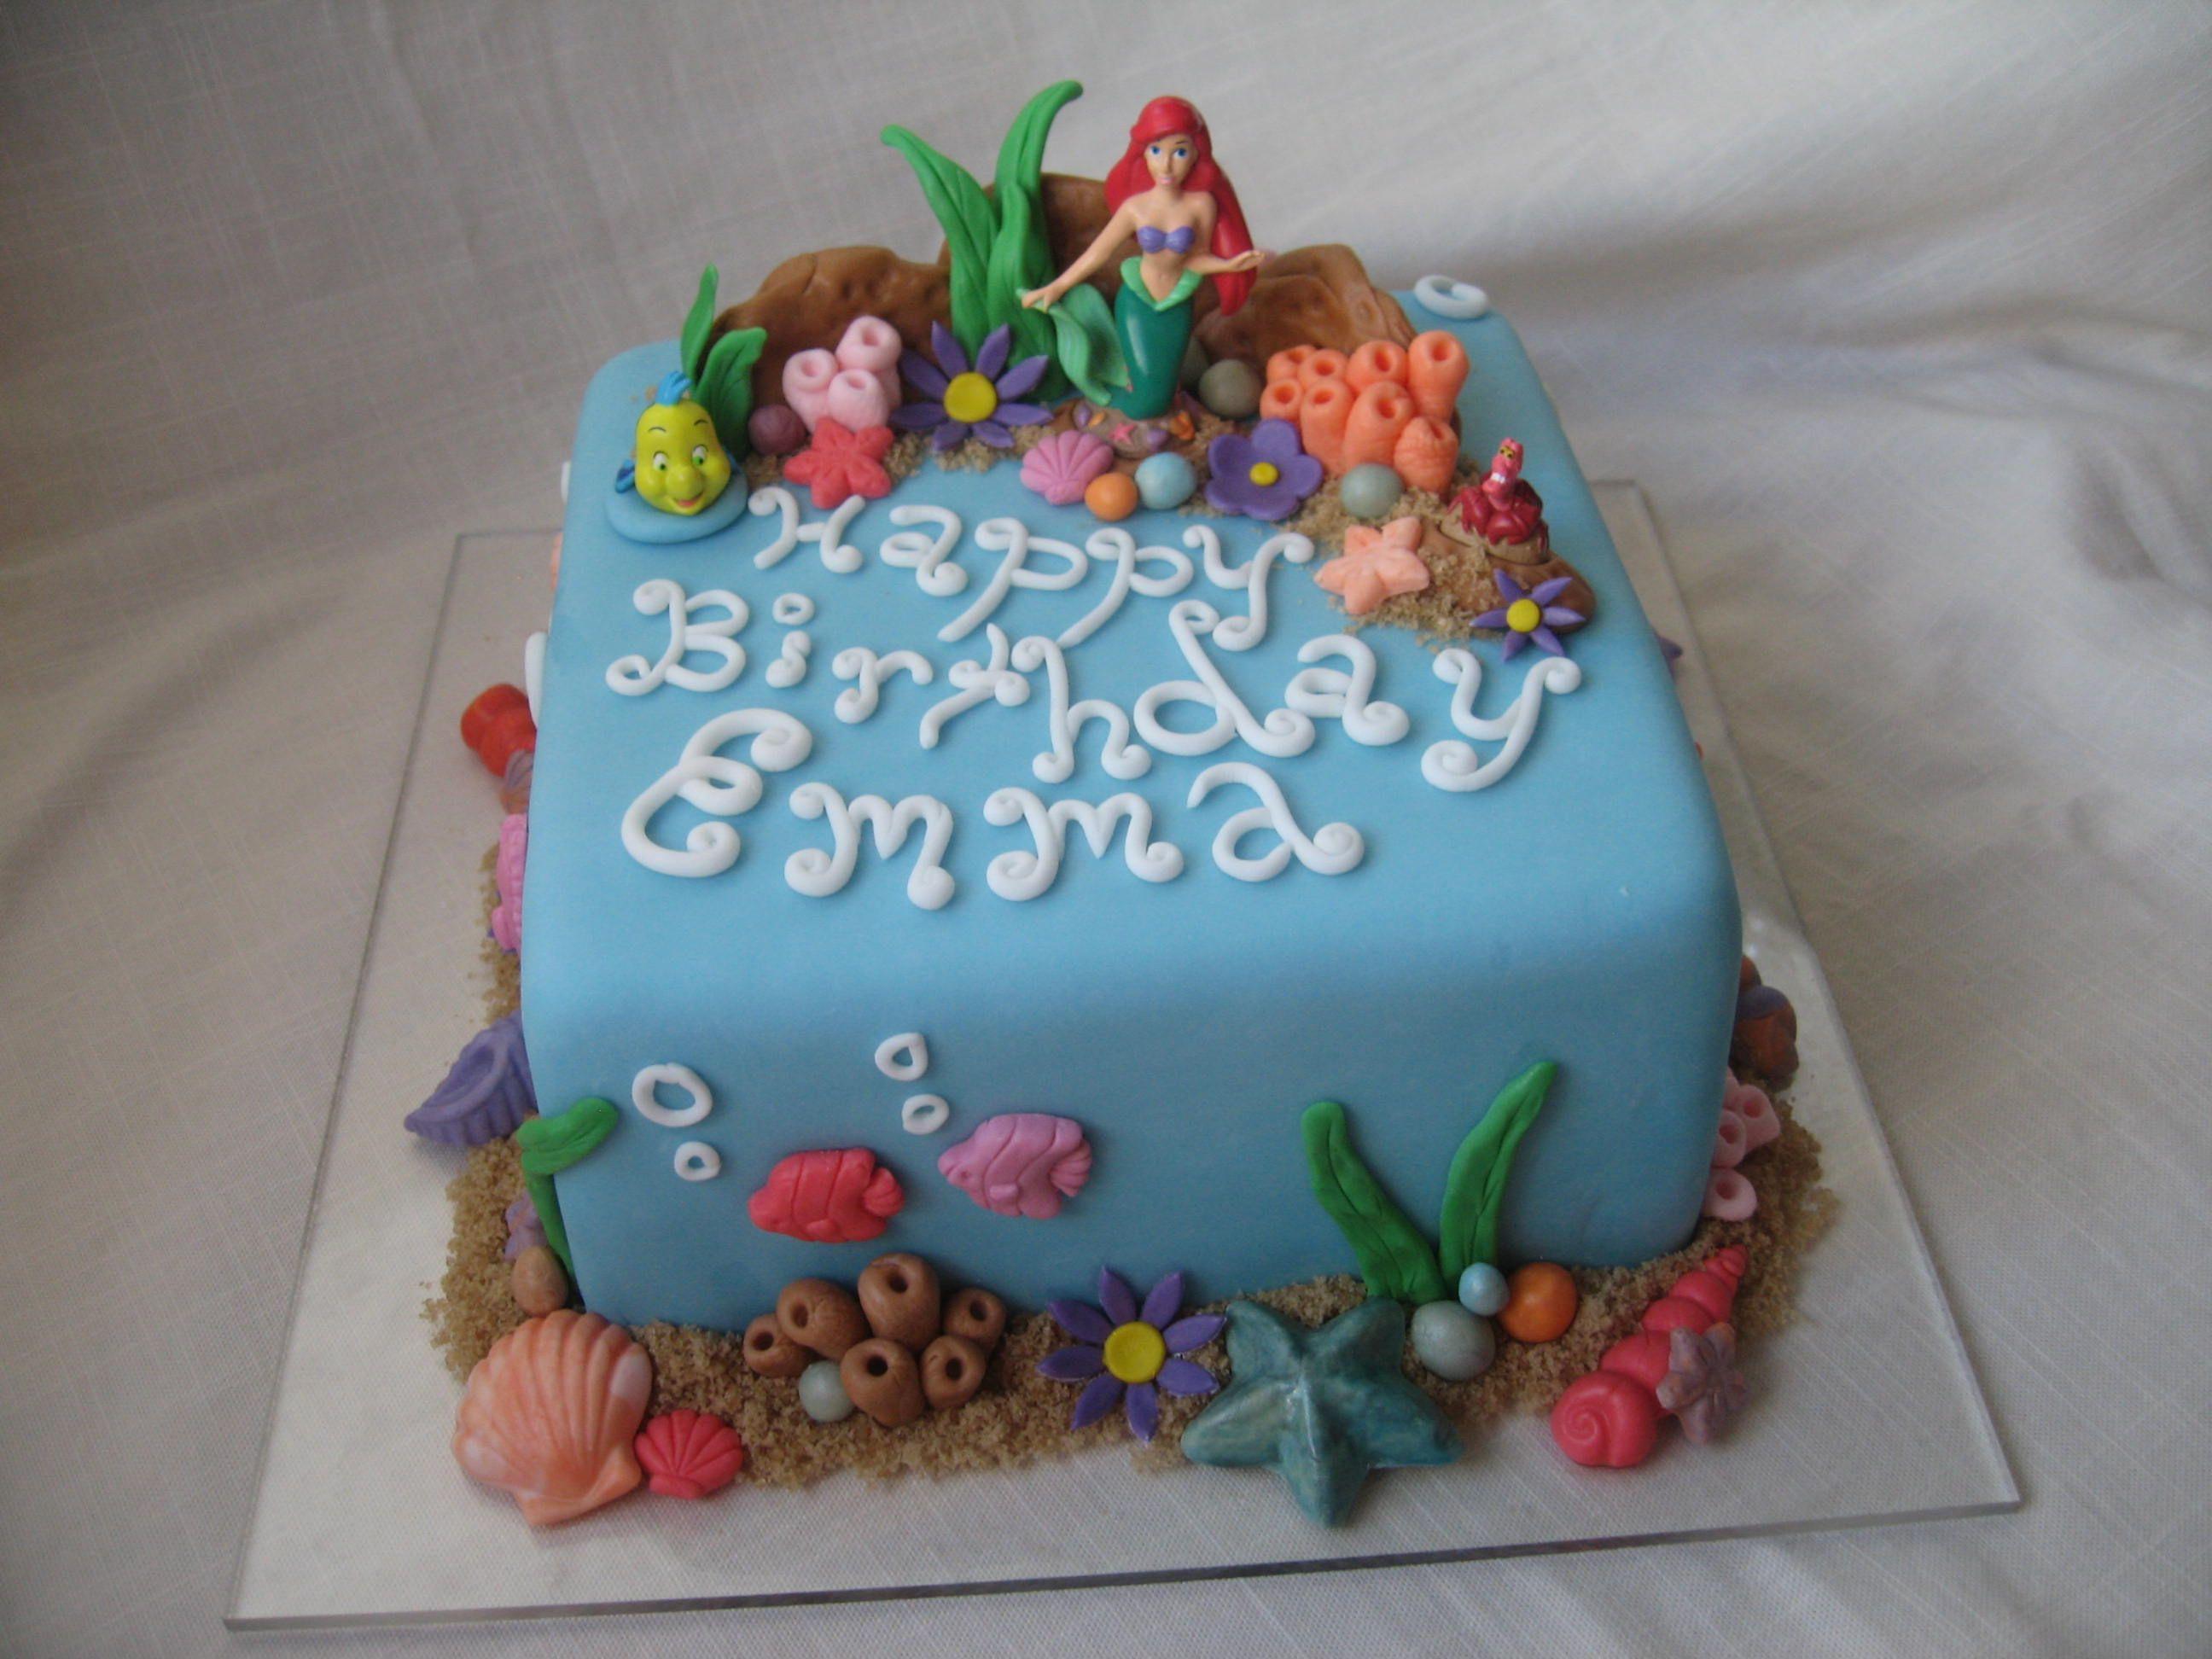 Cake ideas on pinterest pirate cakes marshmallow fondant and - Ariel Cake Idea For Gwen